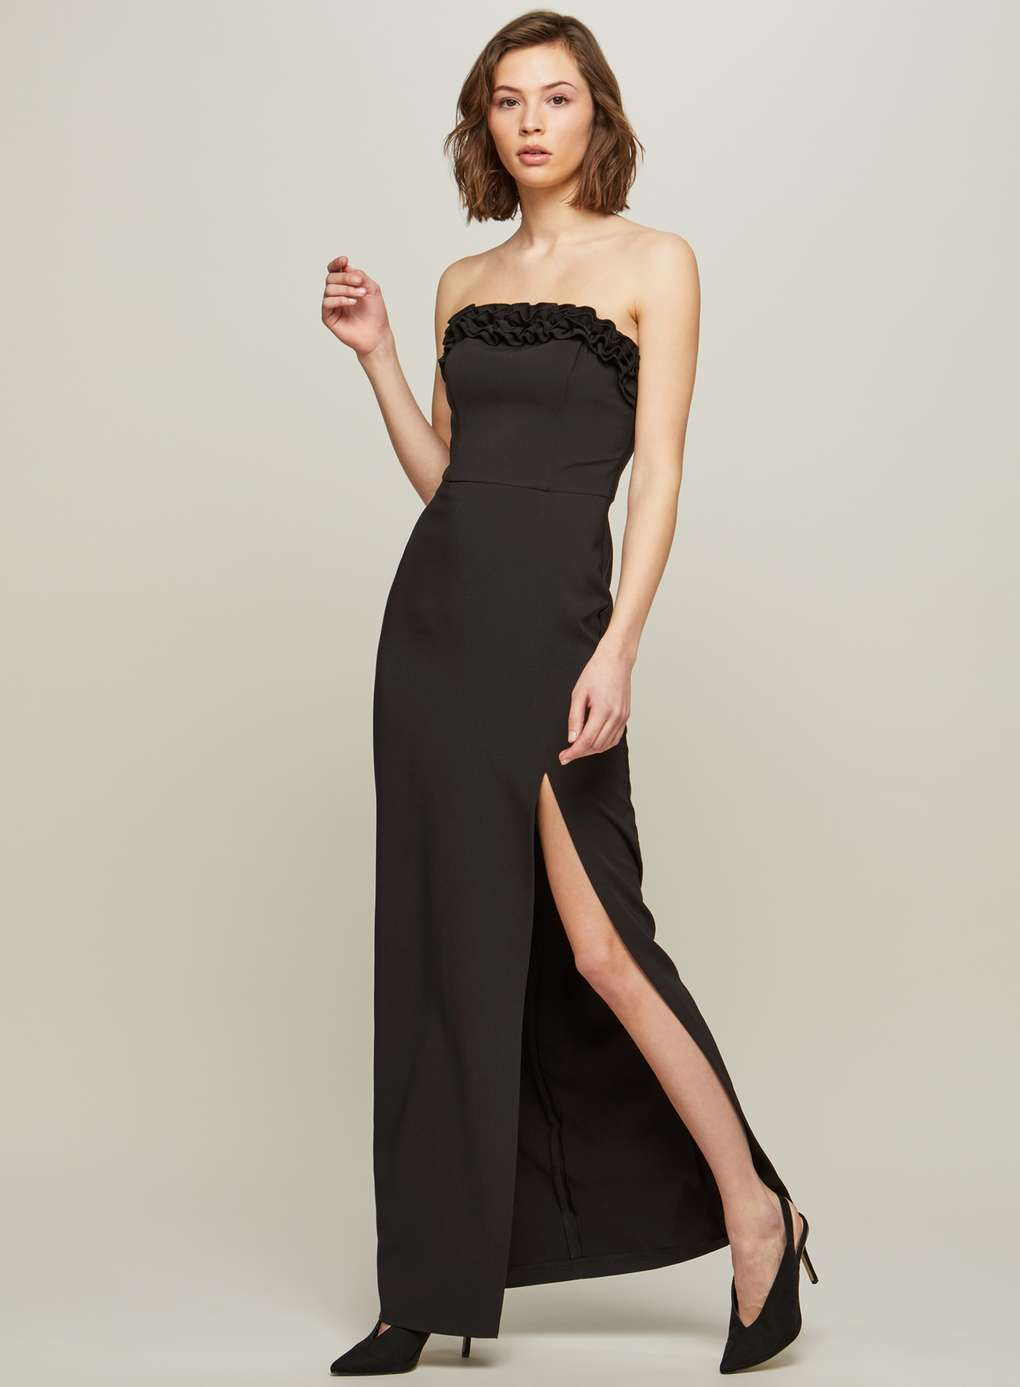 Bandeau Ruffle Maxi Dress Miss Selfridge Us Strapless Dress Formal Maxi Dress Ruffled Maxi Dress [ 1387 x 1020 Pixel ]